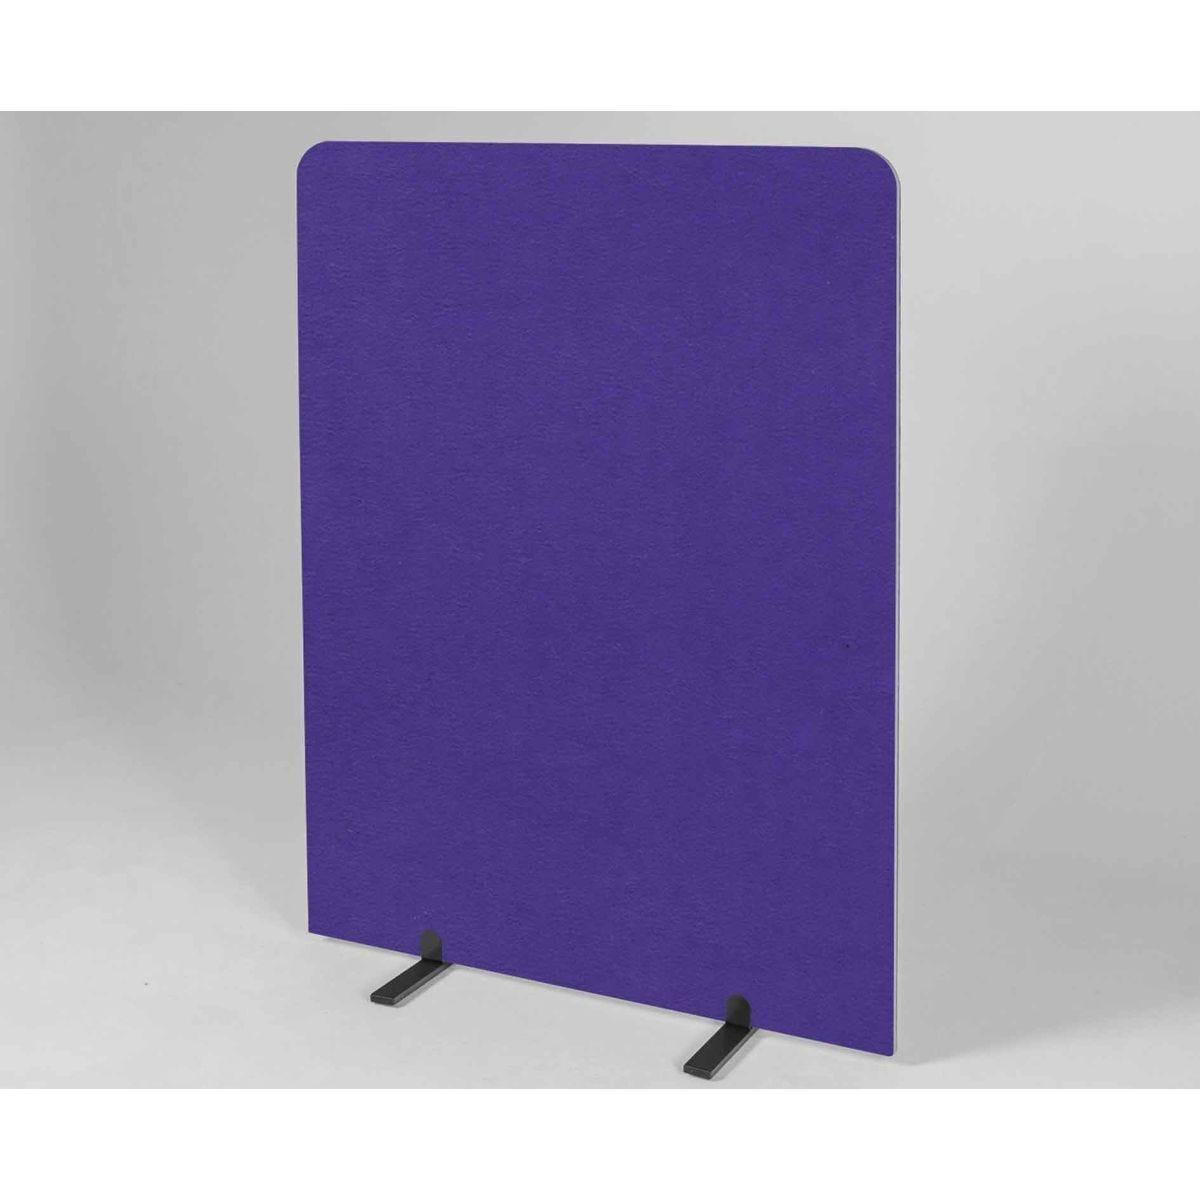 Metroplan BusyScreen Curve Screen 1600 x 1200mm Purple